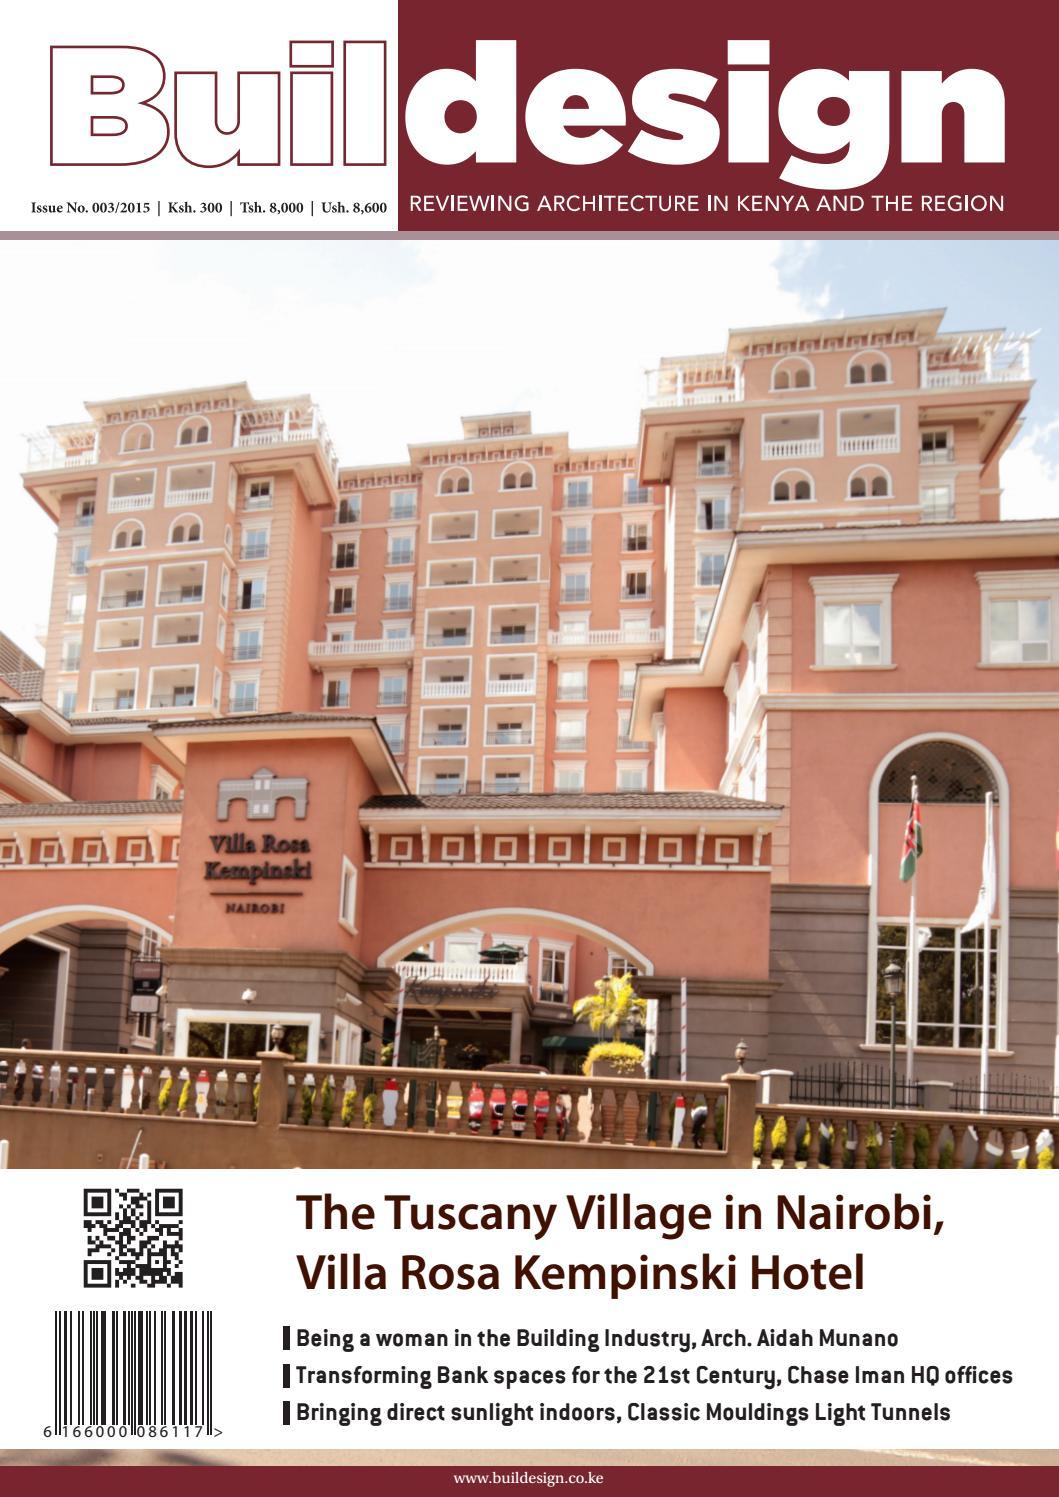 Buildesign magazine issue 014 by buildesign magazine issuu